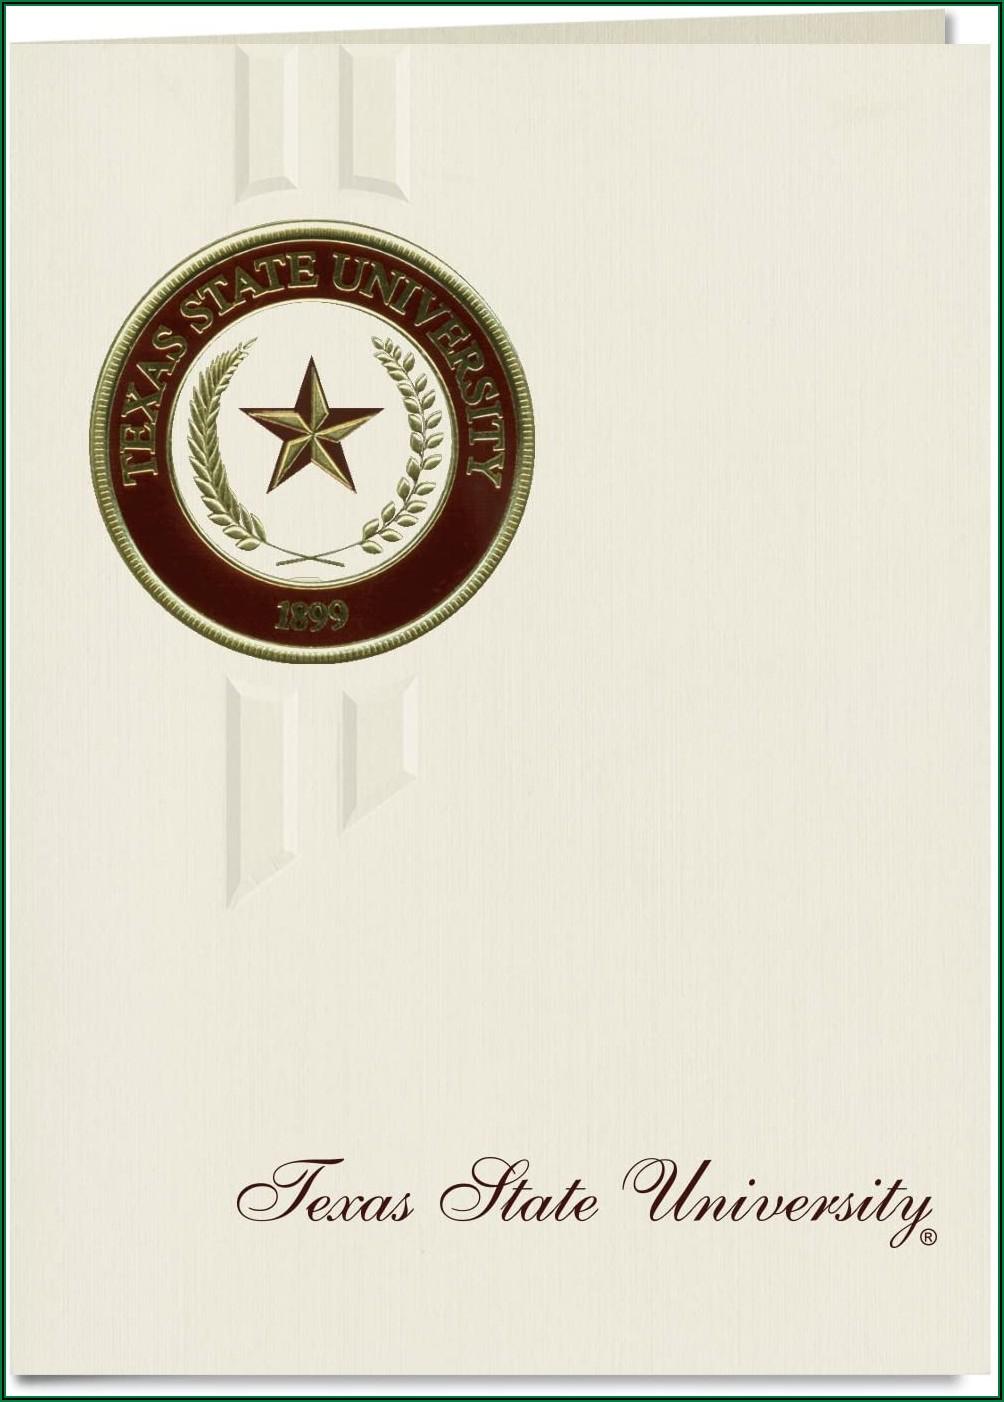 Texas State University Graduation Announcements